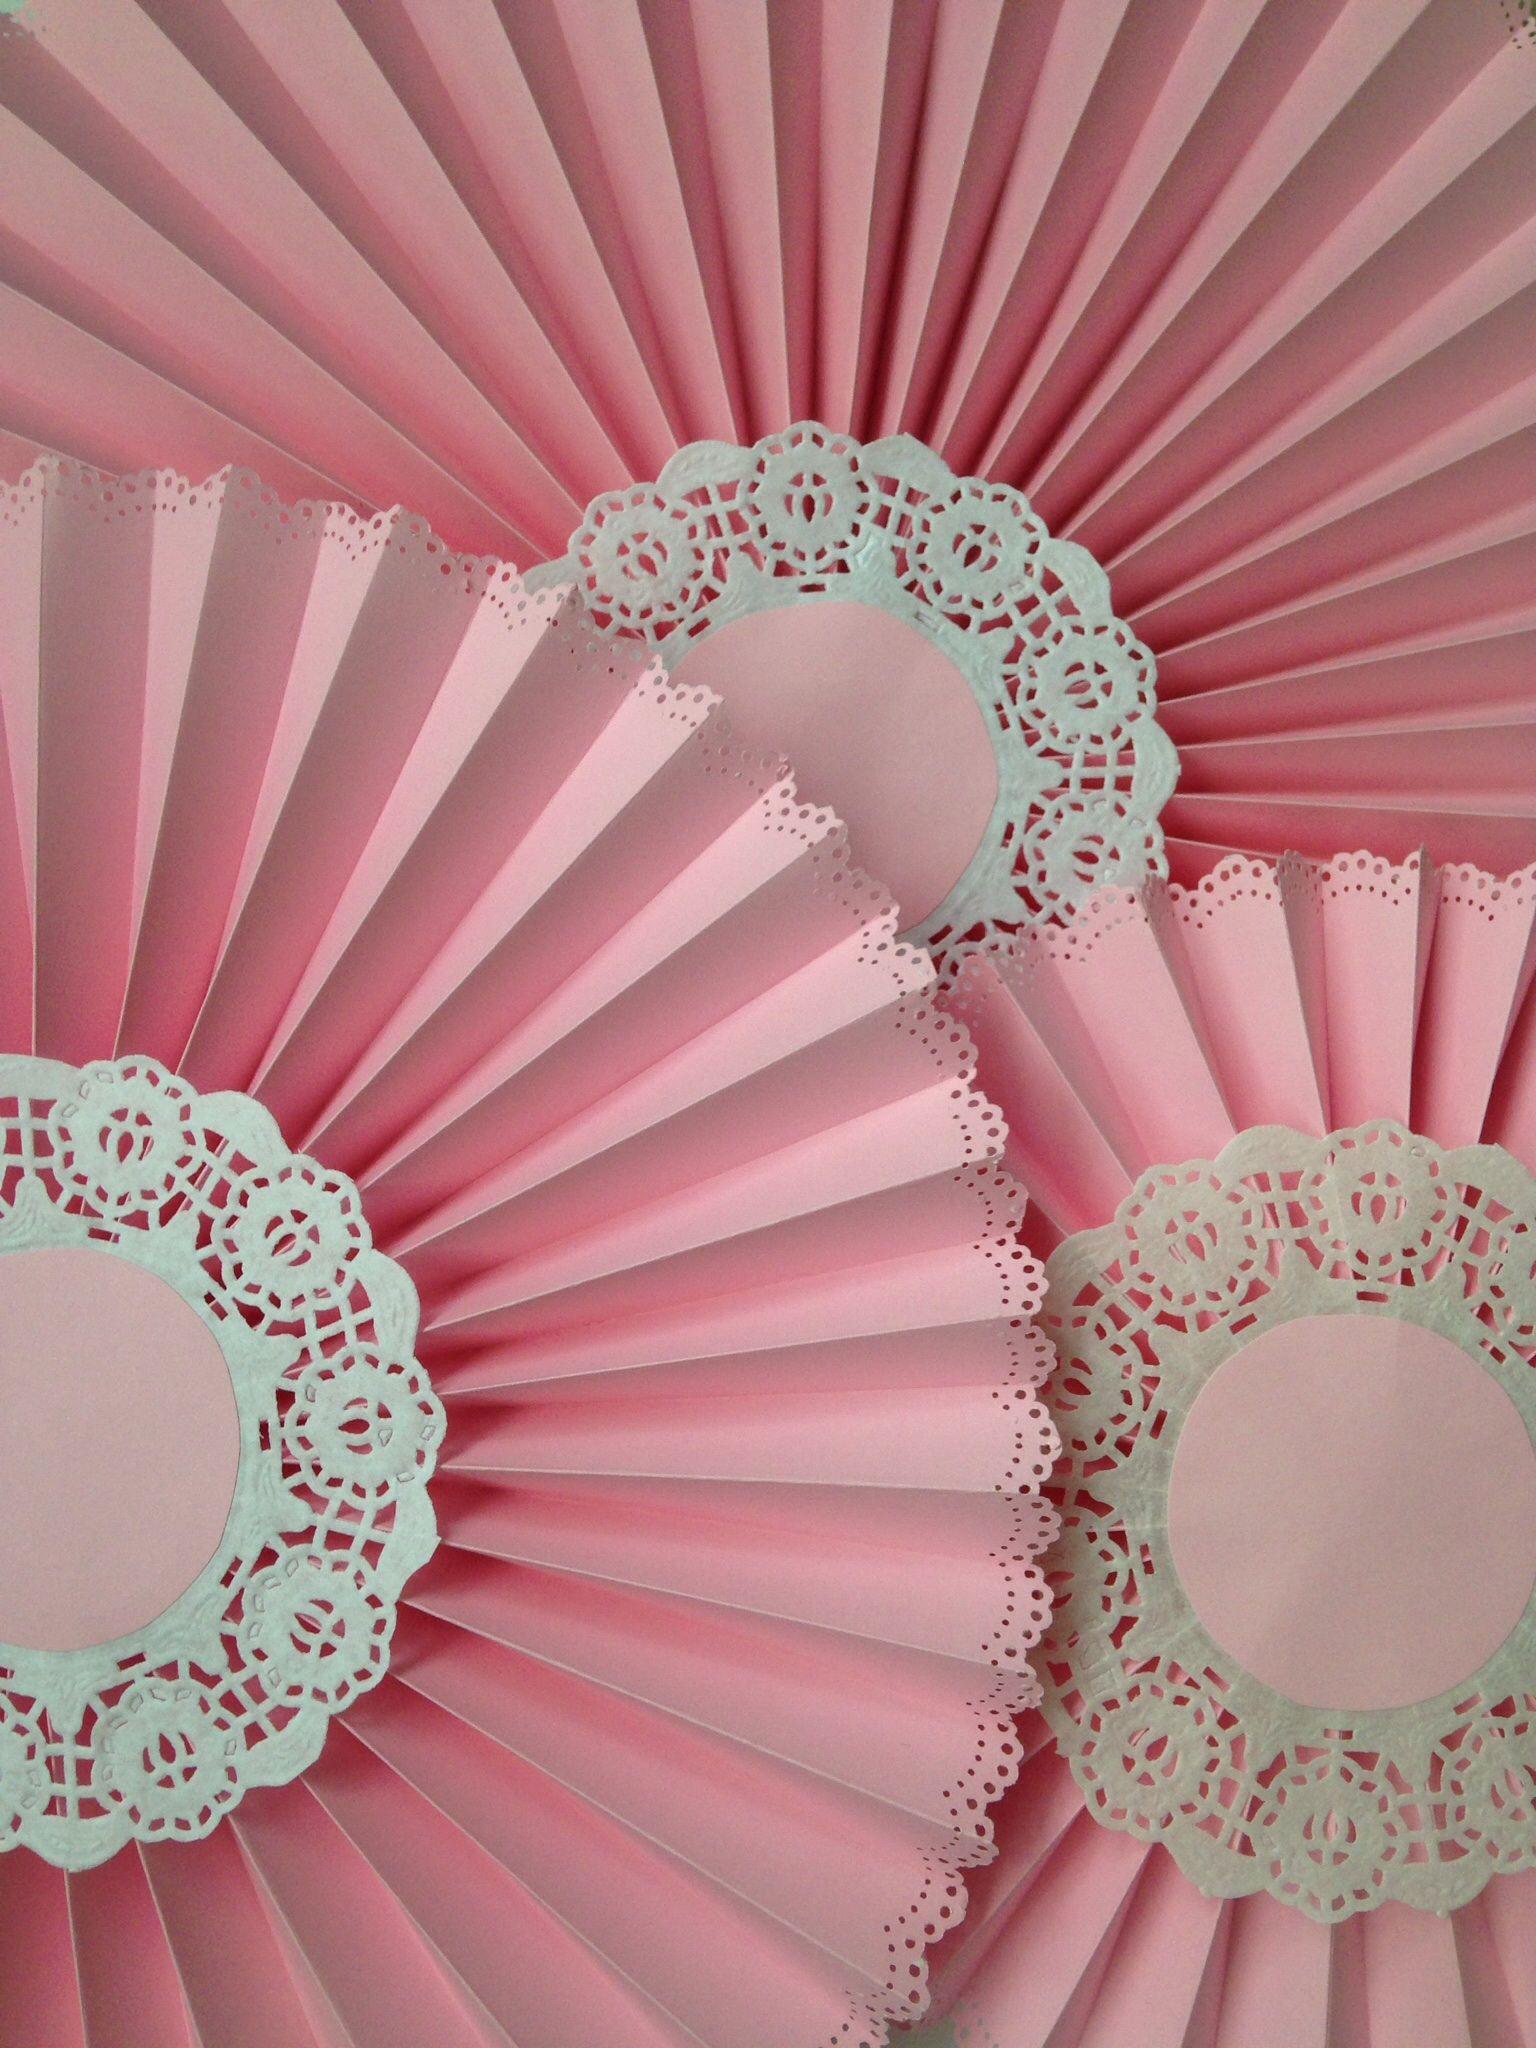 Abanicos pink flor pinterest pink abanicos de for Decoracion con abanicos